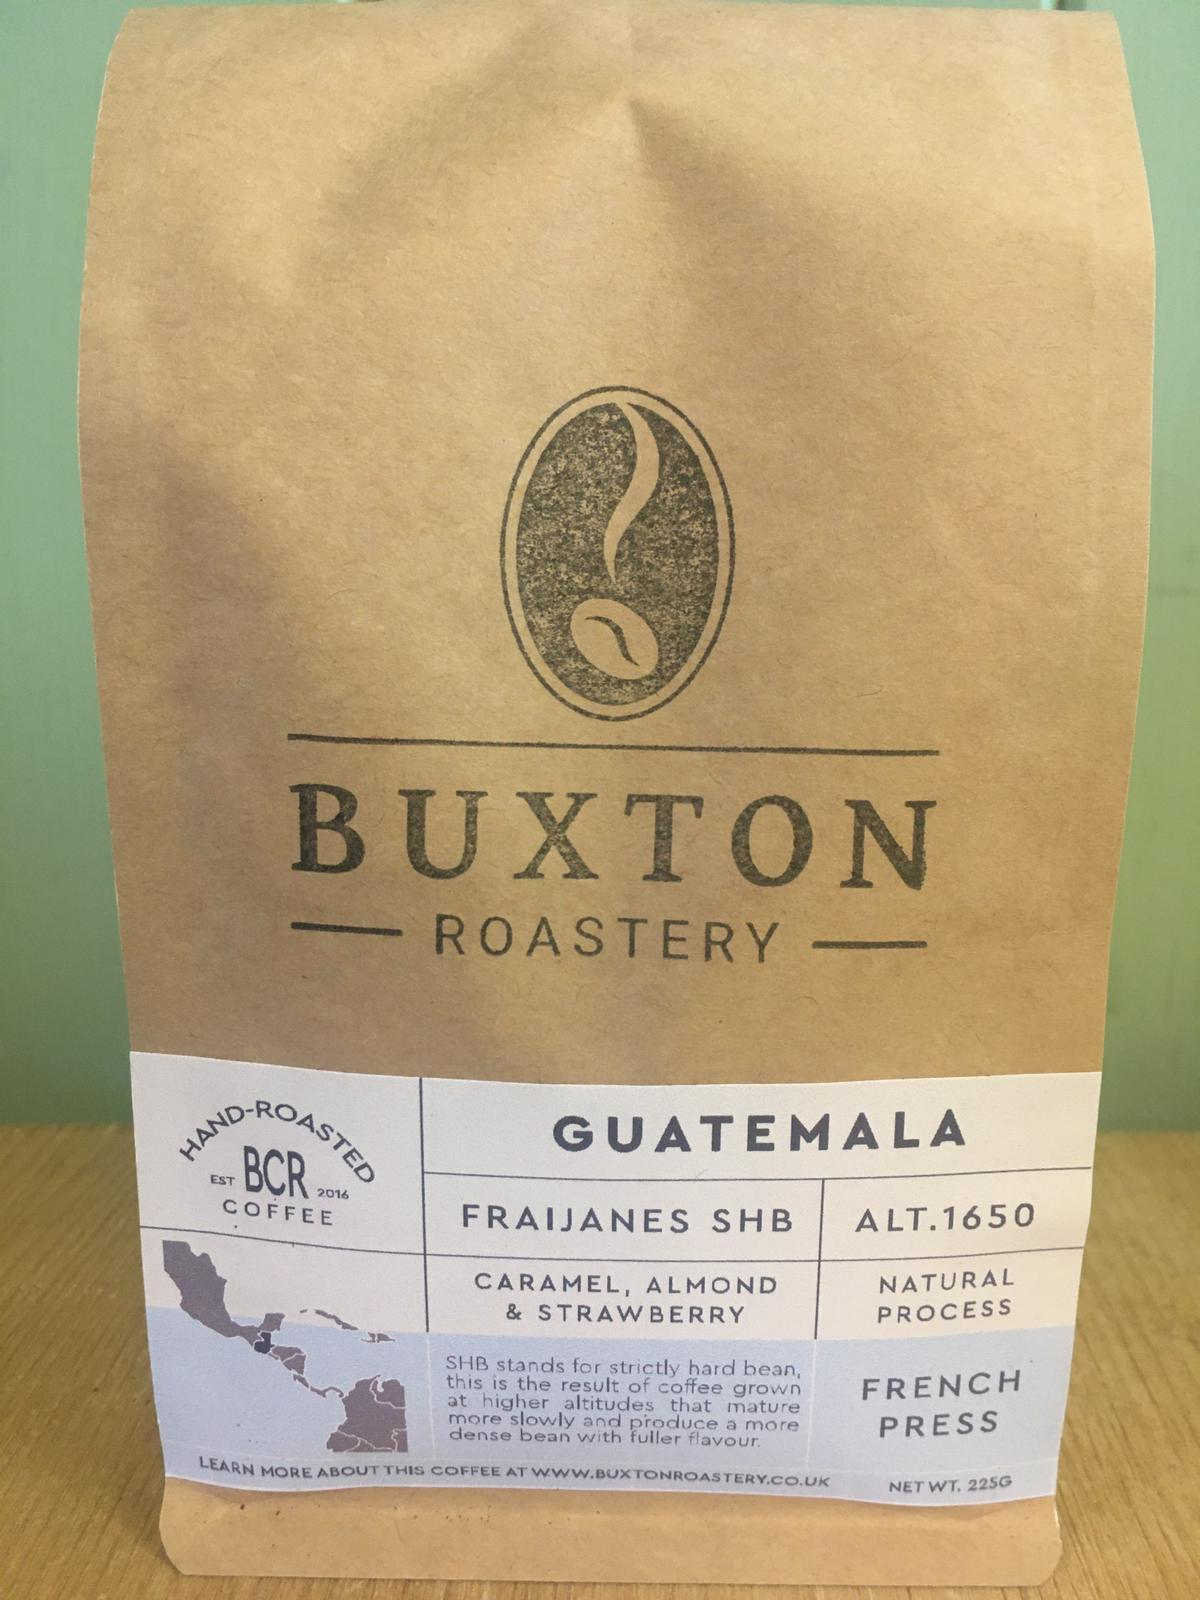 Buxton Roastery Coffee - Guatemala Fraijanes SHB 225g